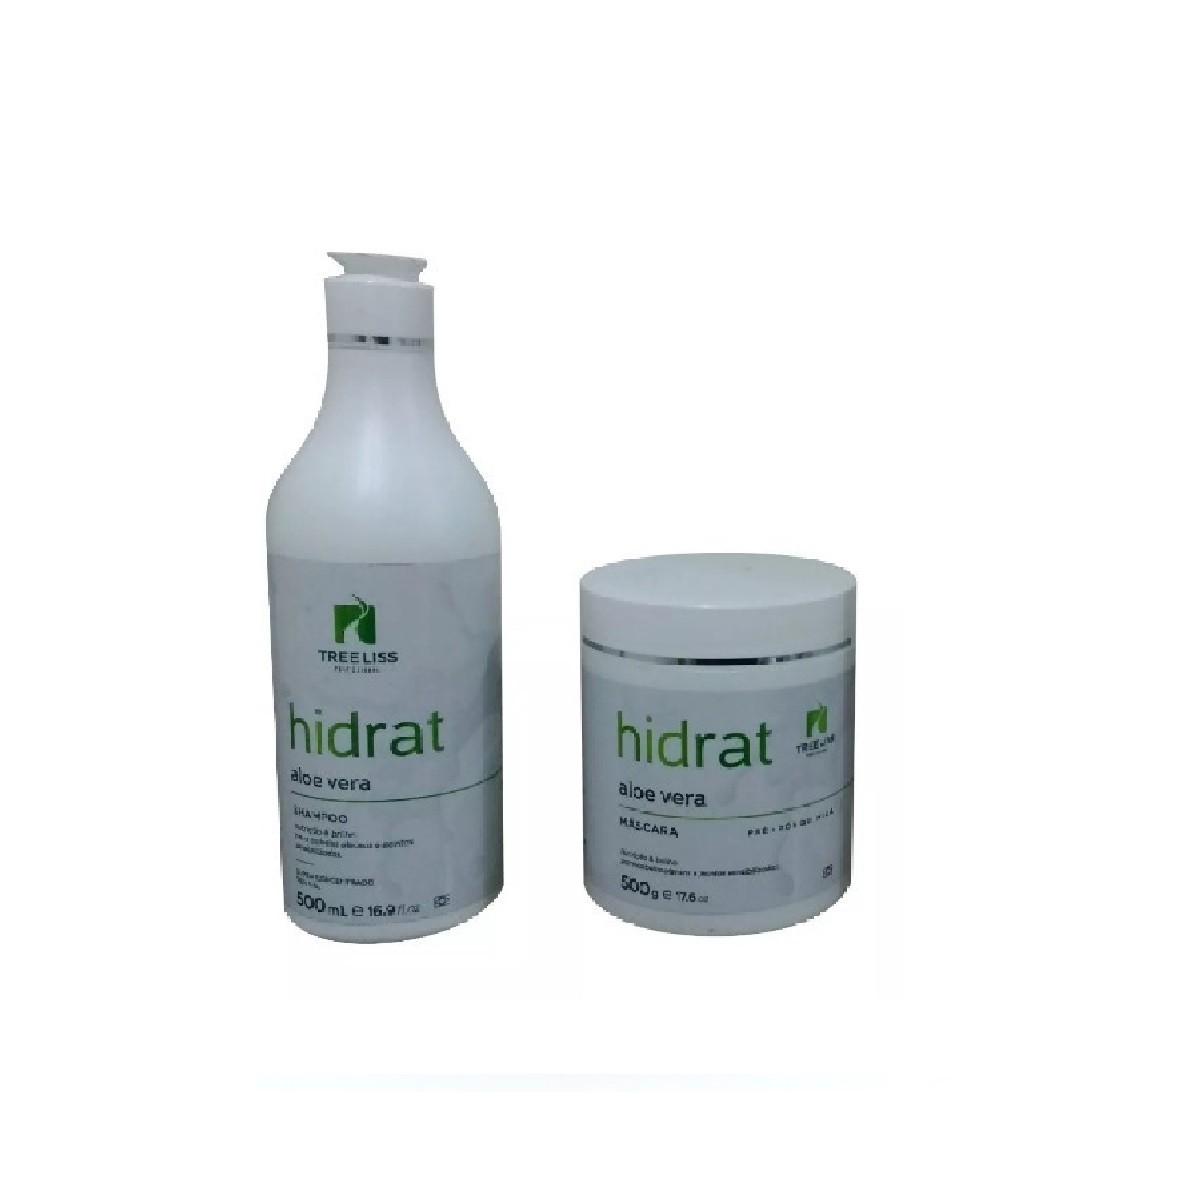 Tree Liss Kit Hidrat Aloe Vera Shampoo+Máscara 2X 500ml - R